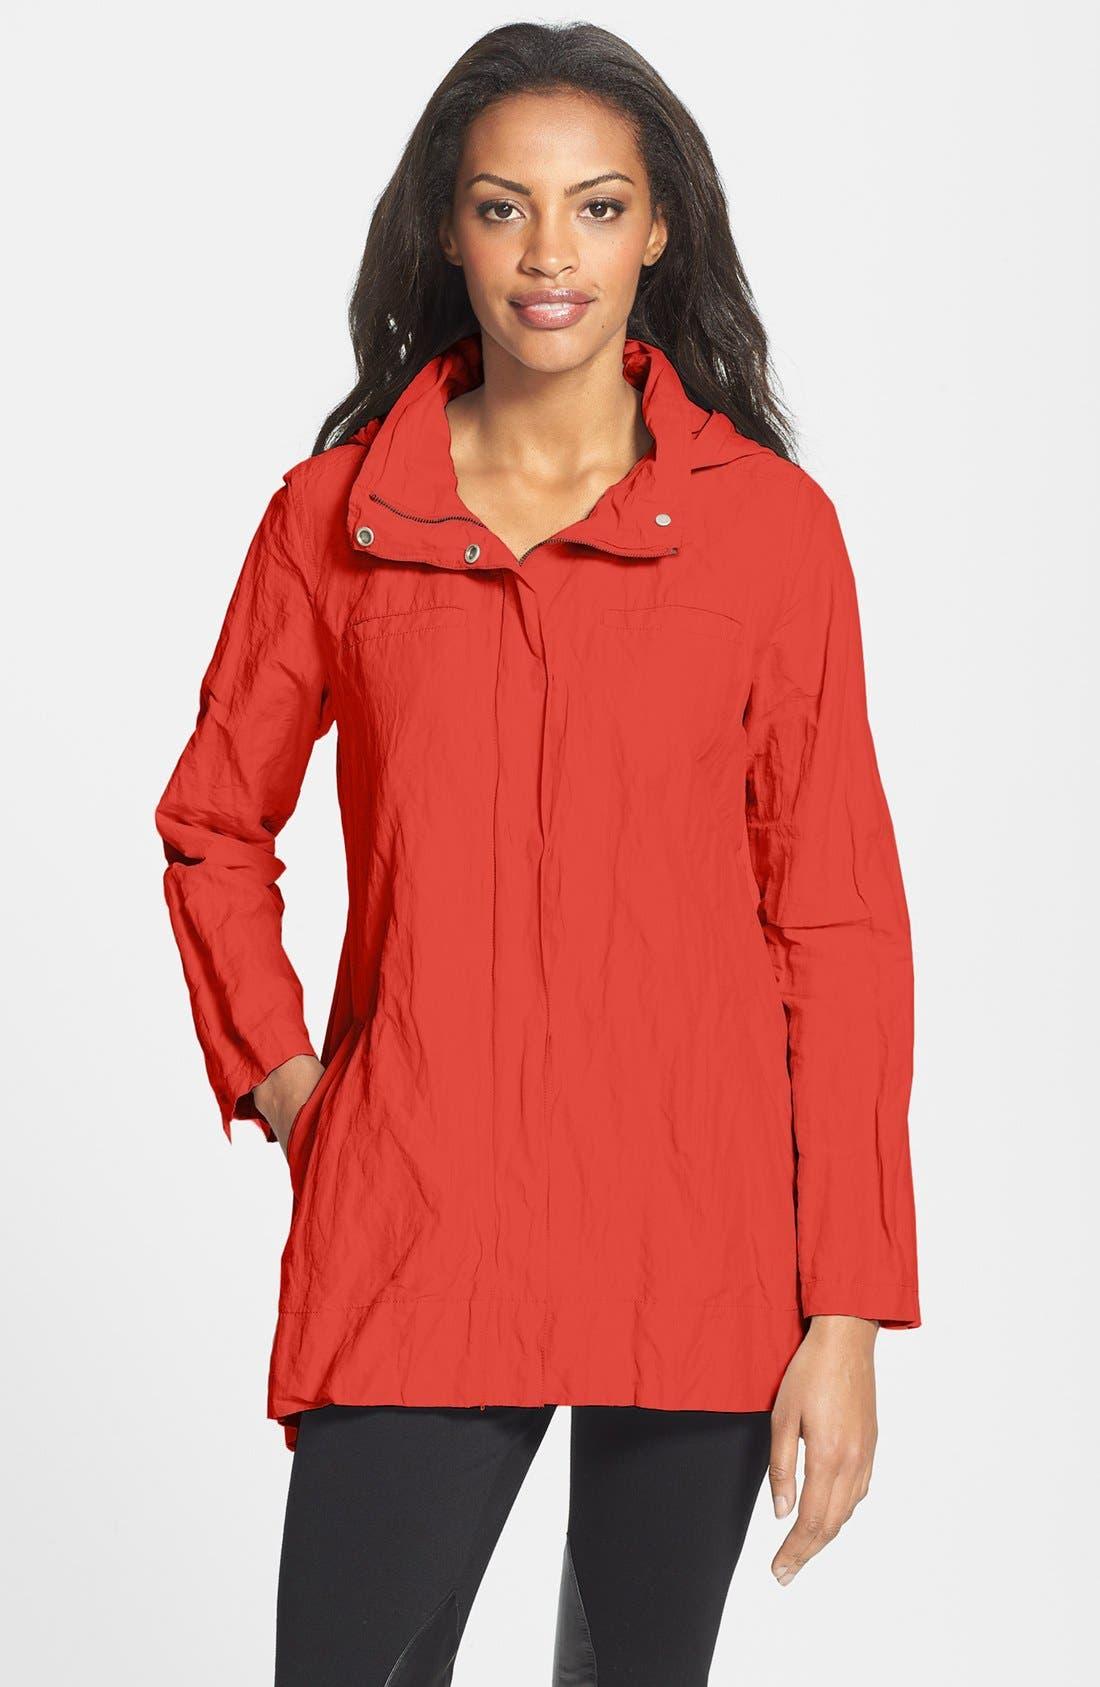 Alternate Image 1 Selected - Eileen Fisher Roll Sleeve Crinkled Jacket (Regular & Petite)